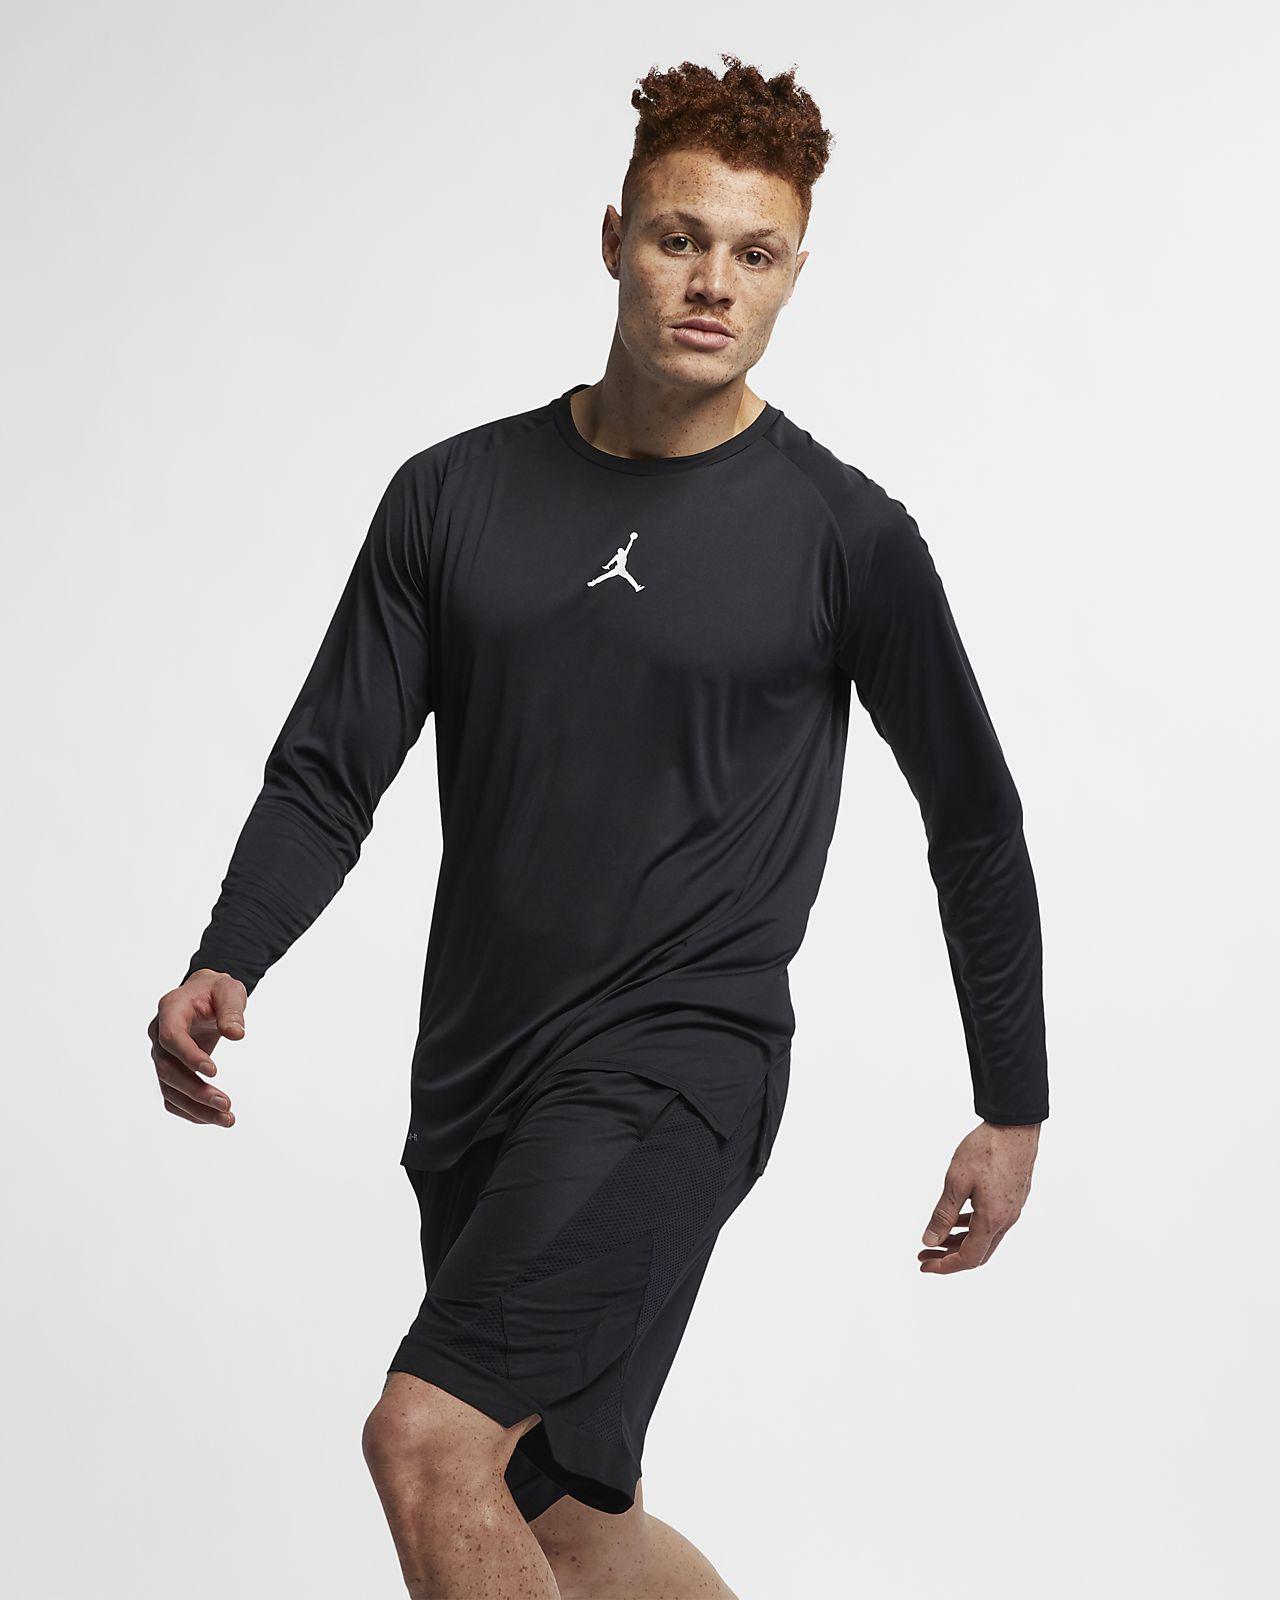 Jordan 23 Alpha Fitted 男子长袖训练上衣